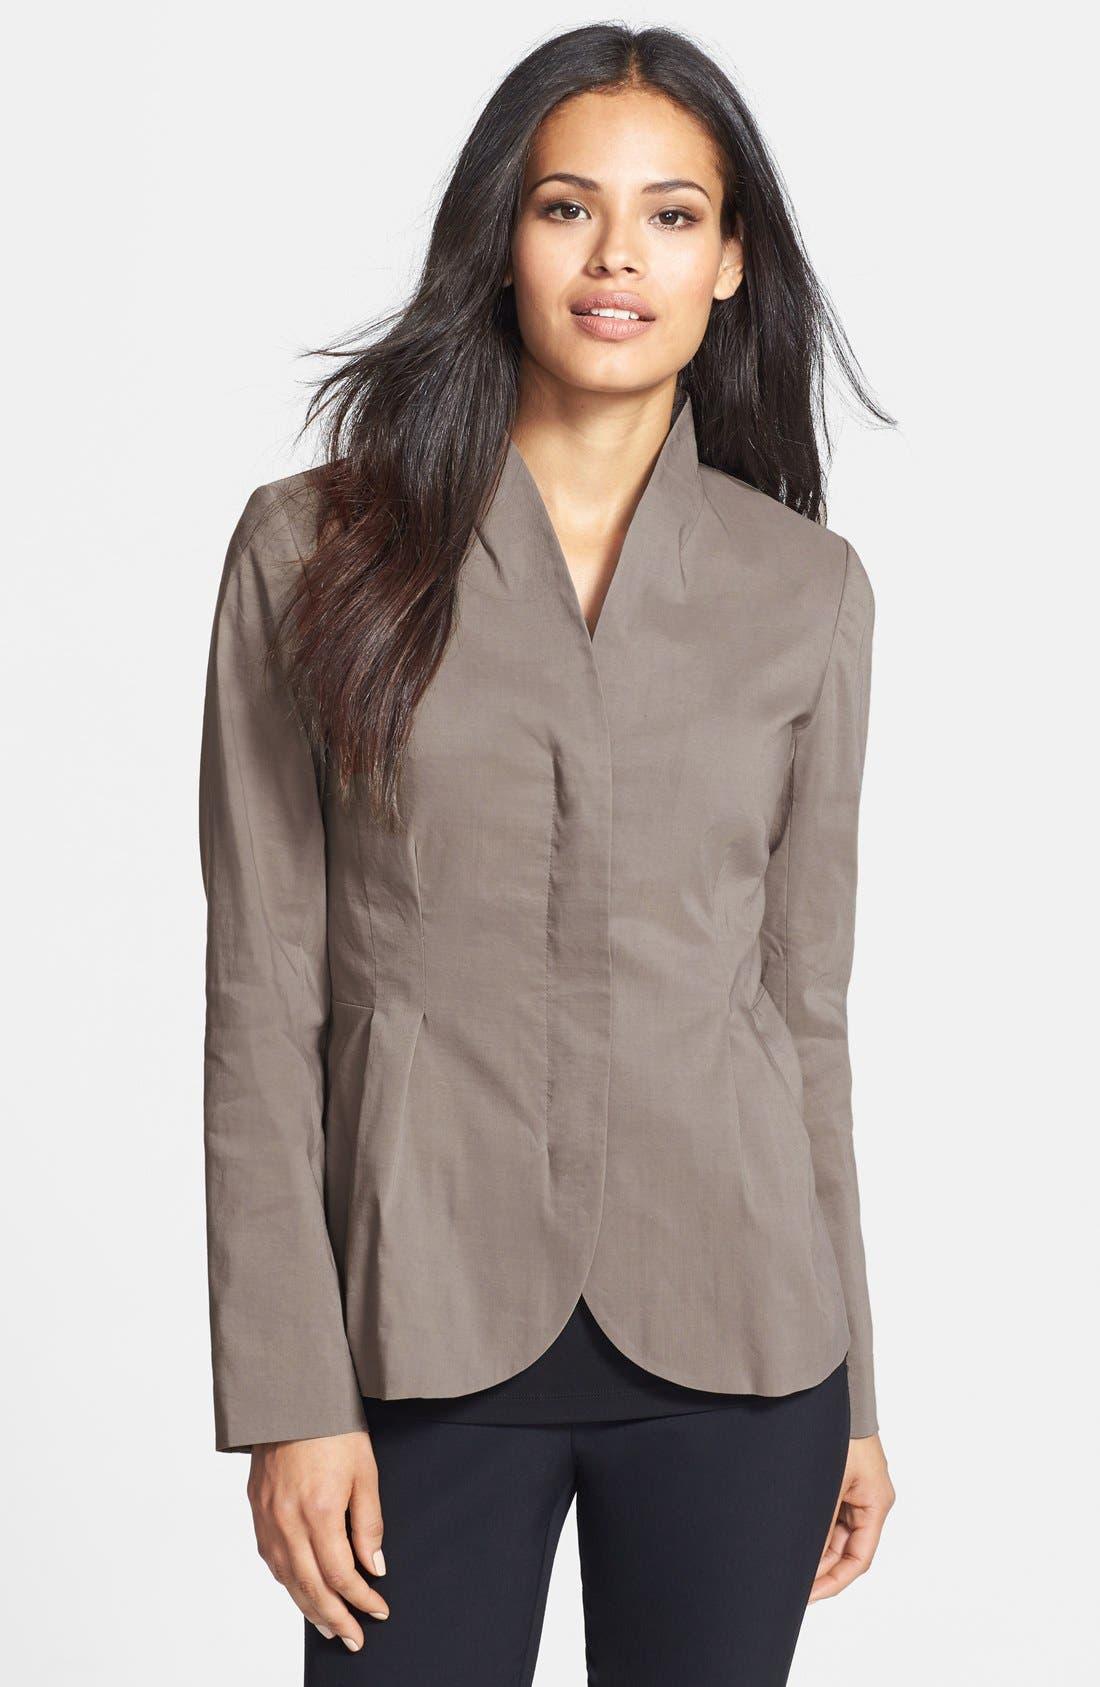 Alternate Image 1 Selected - Eileen Fisher High Collar Peplum Jacket (Regular & Petite)